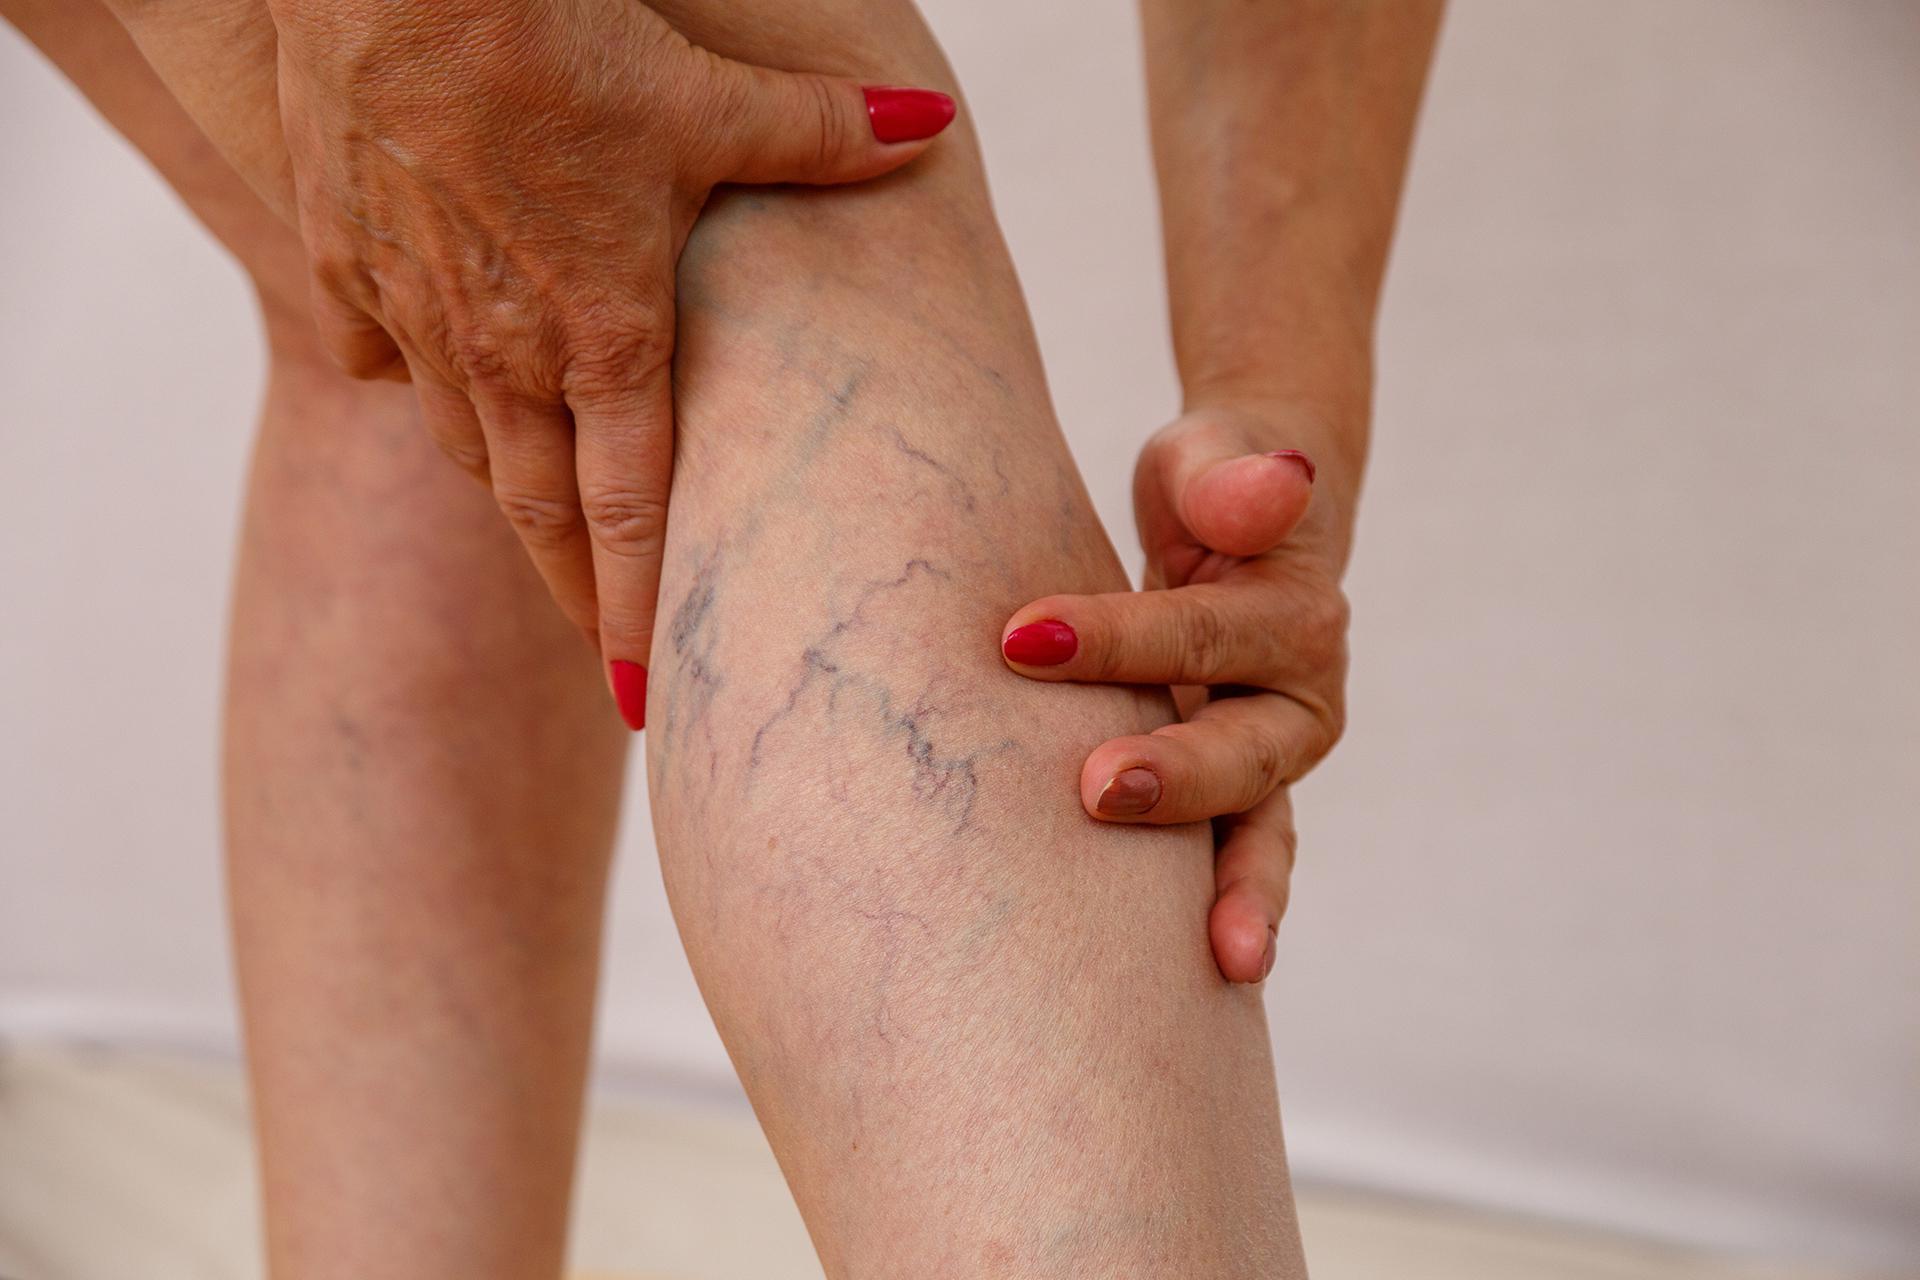 vascular-issues-requiring-leg-pain-doctor-Van-Nuys